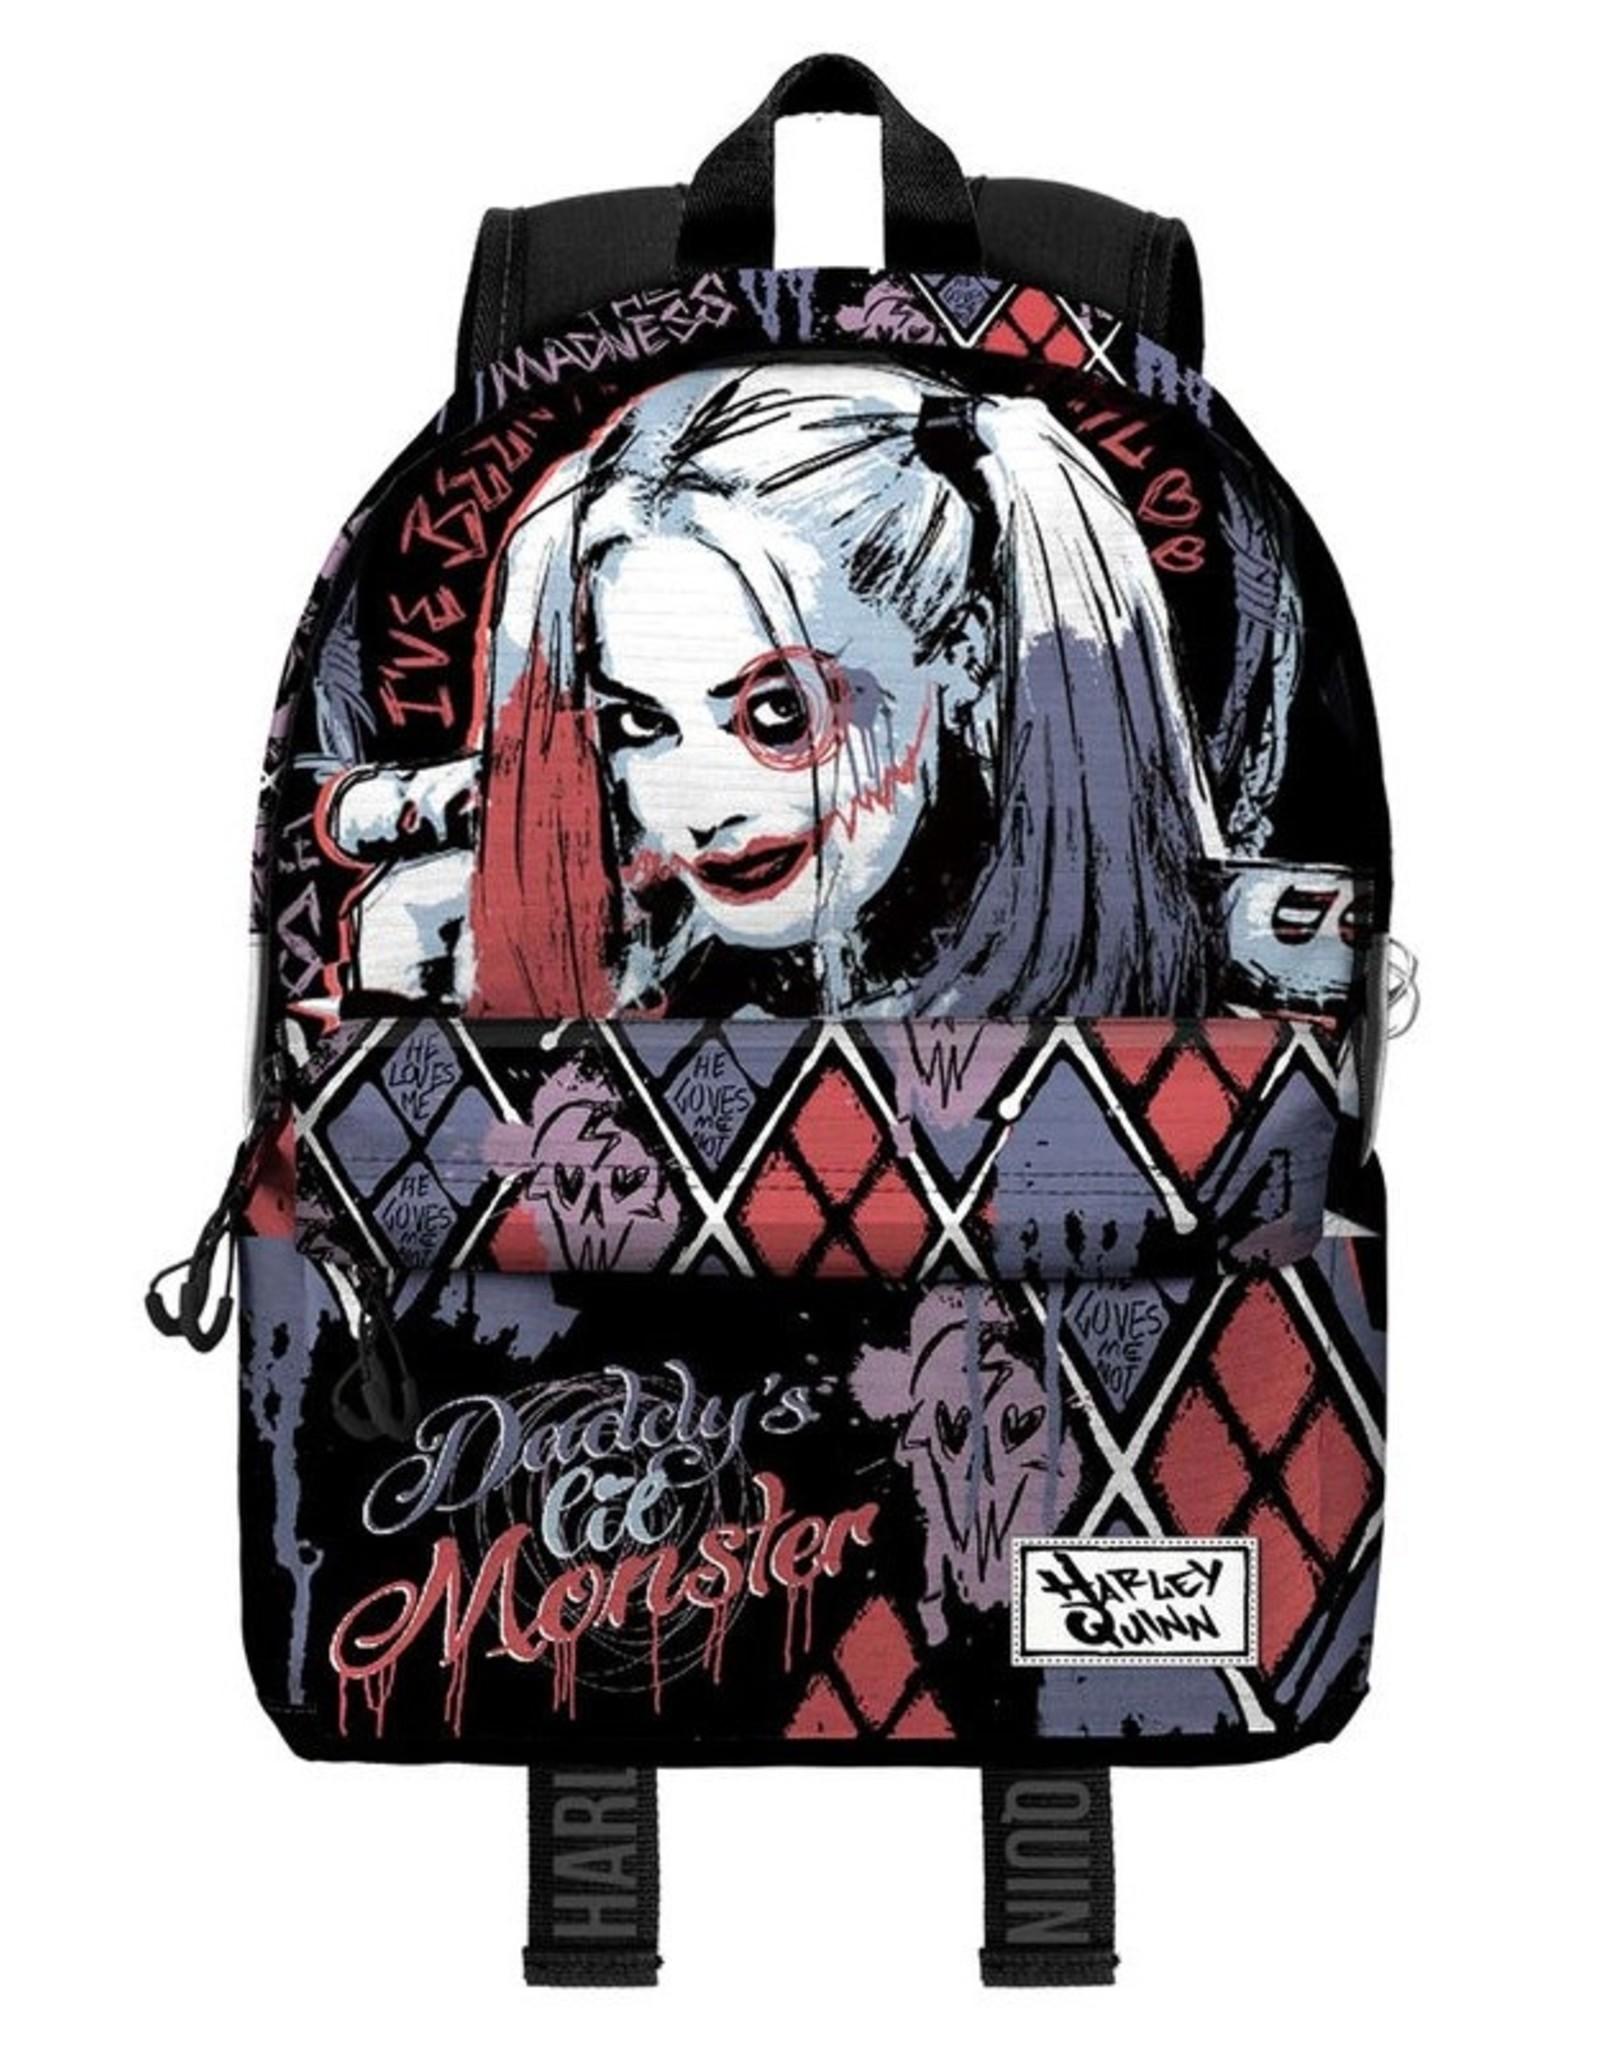 NEW!! Official Licensed DC Comics Harley Quinn Rucksack